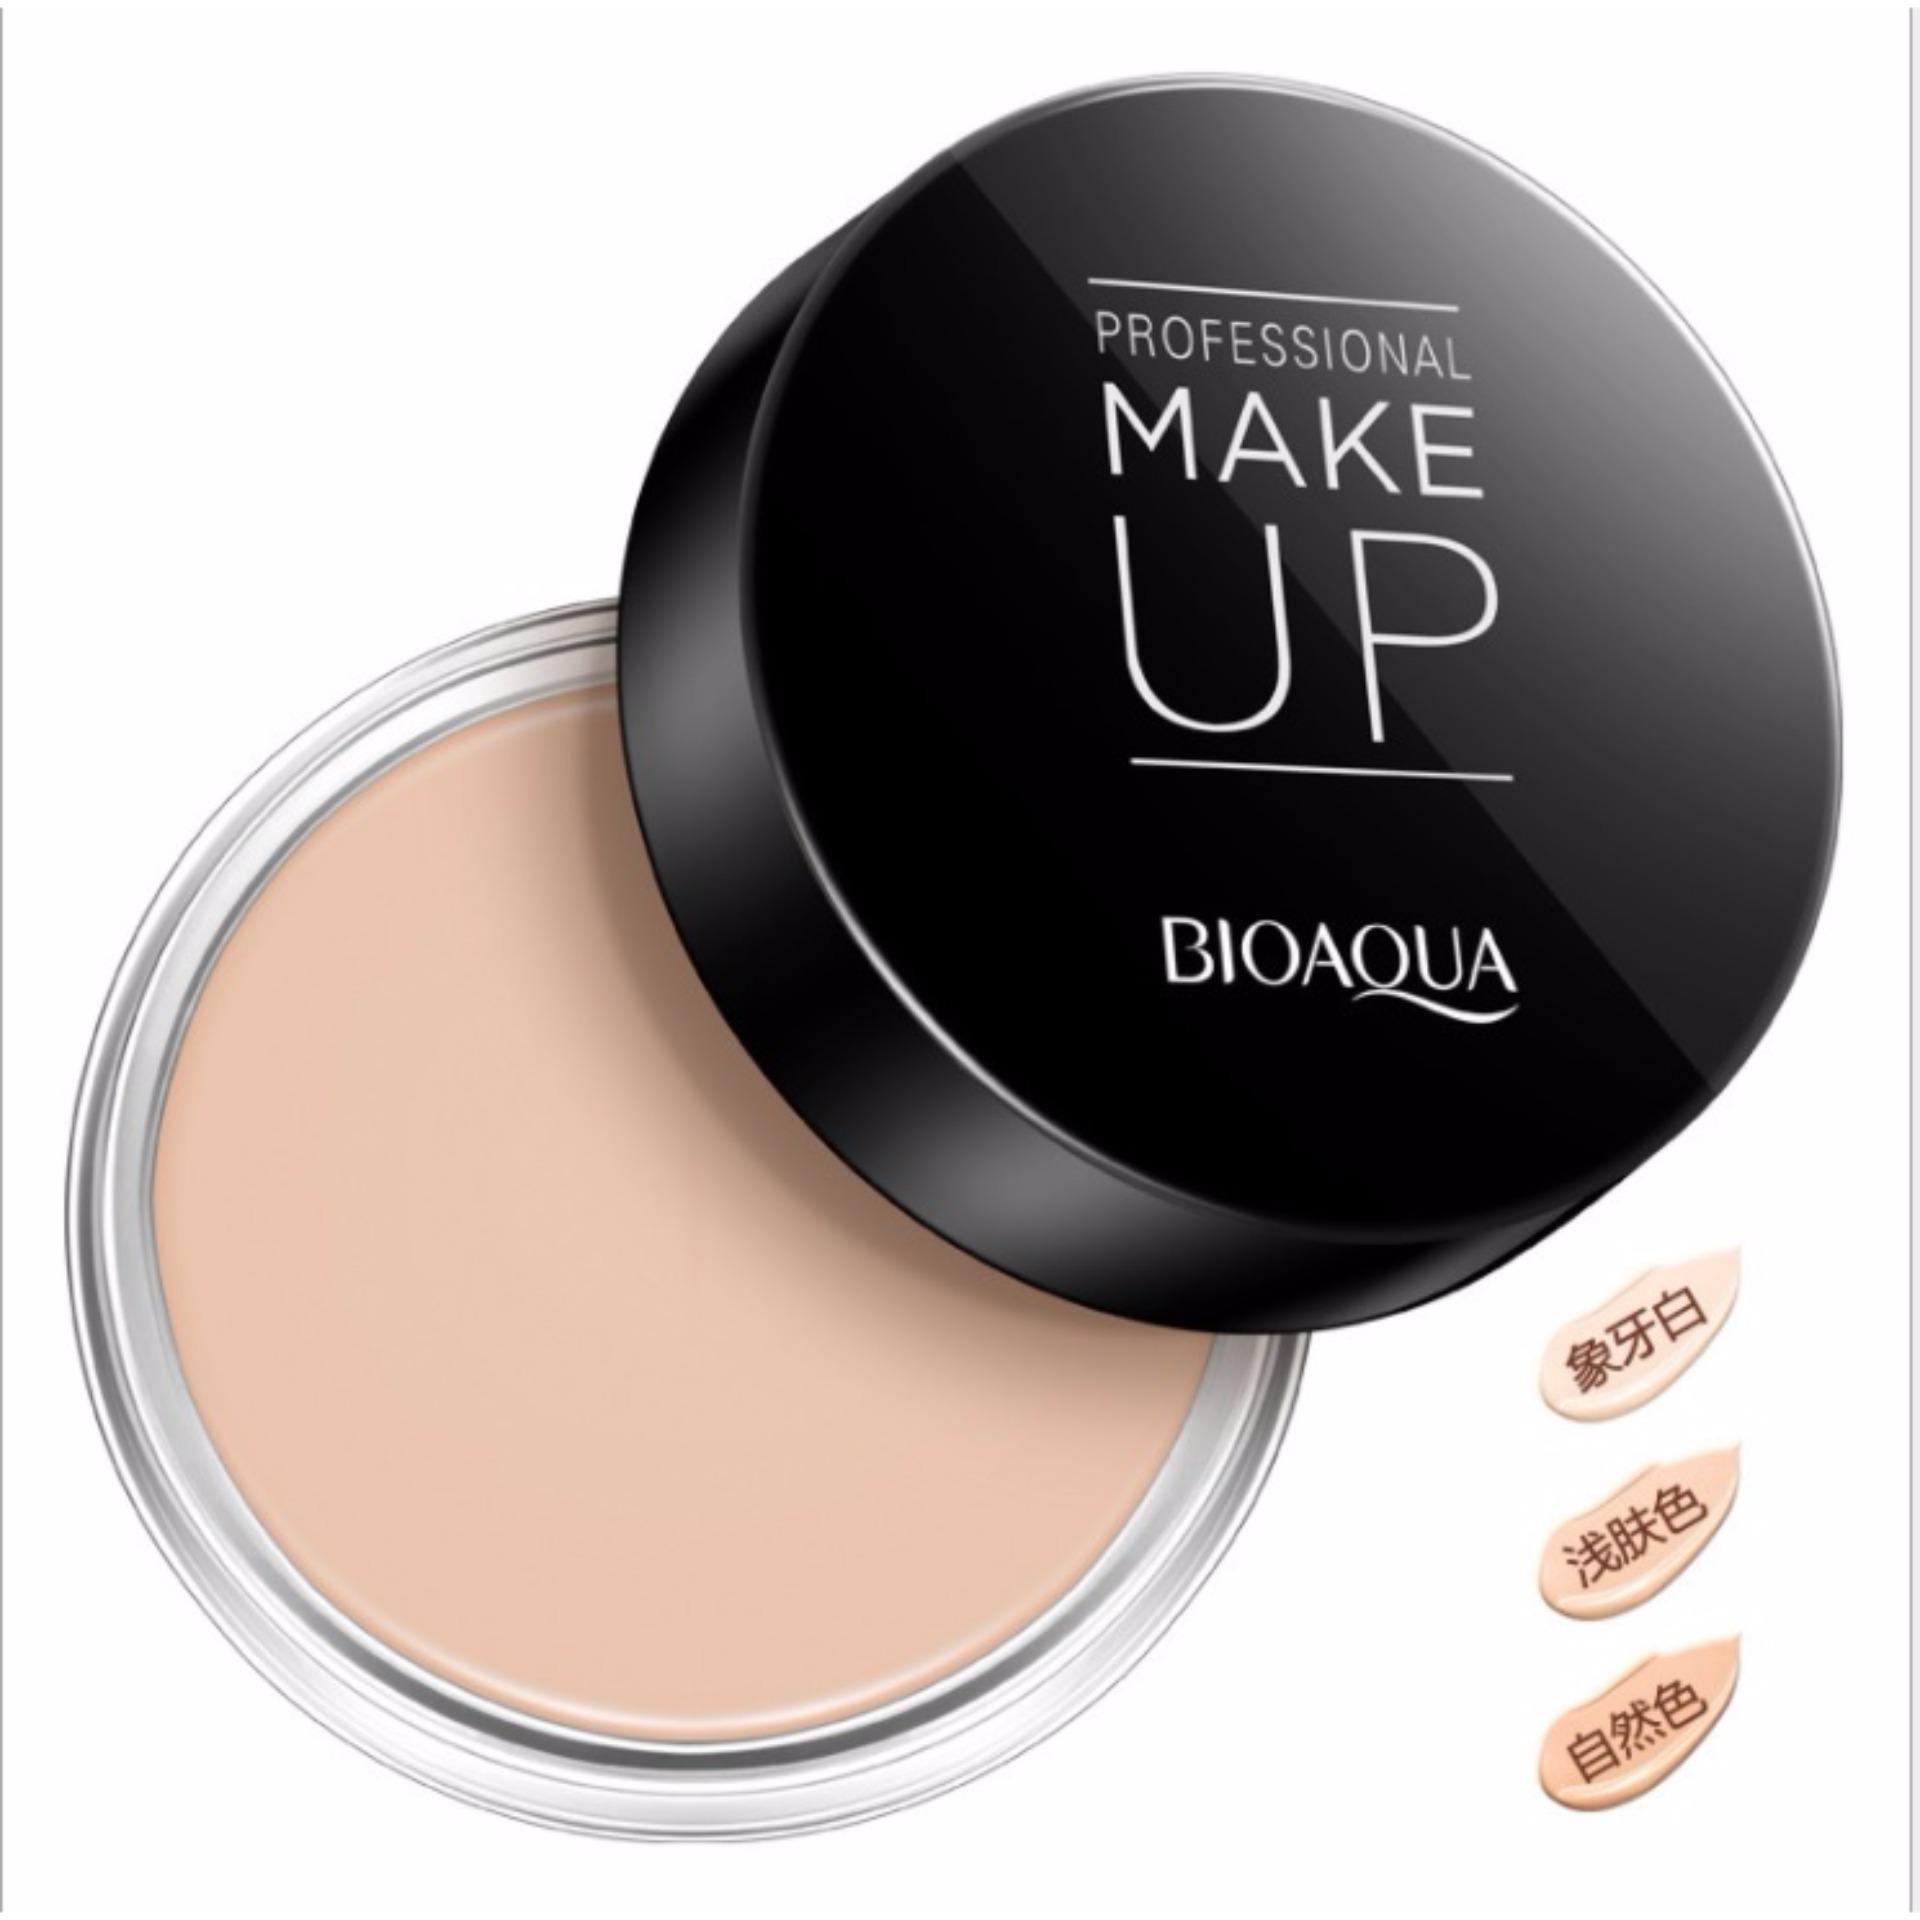 Bioaqua BQY9964-2 Makeup Concealer 10g (02 Ivory White) Philippines